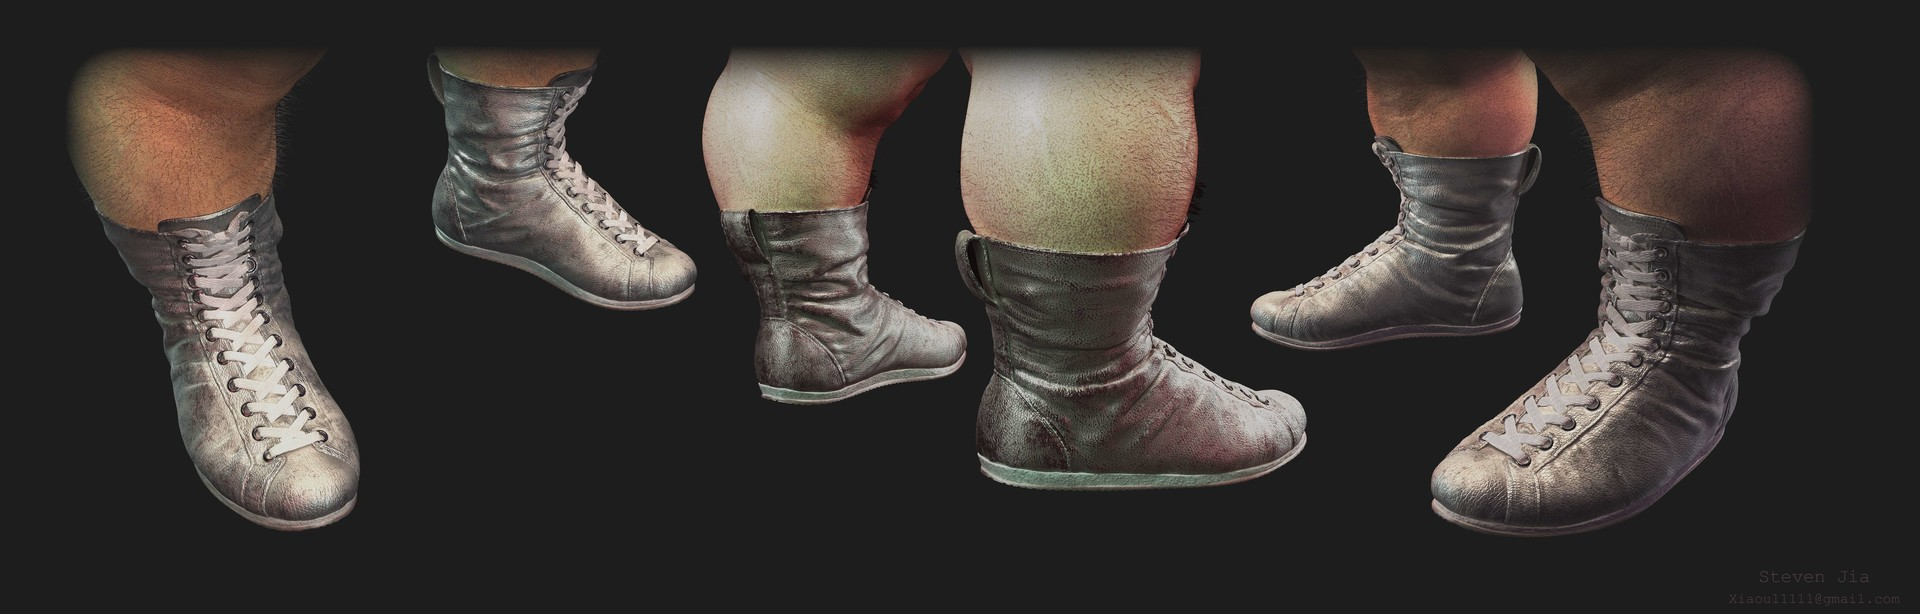 Steven jia shoes 2048